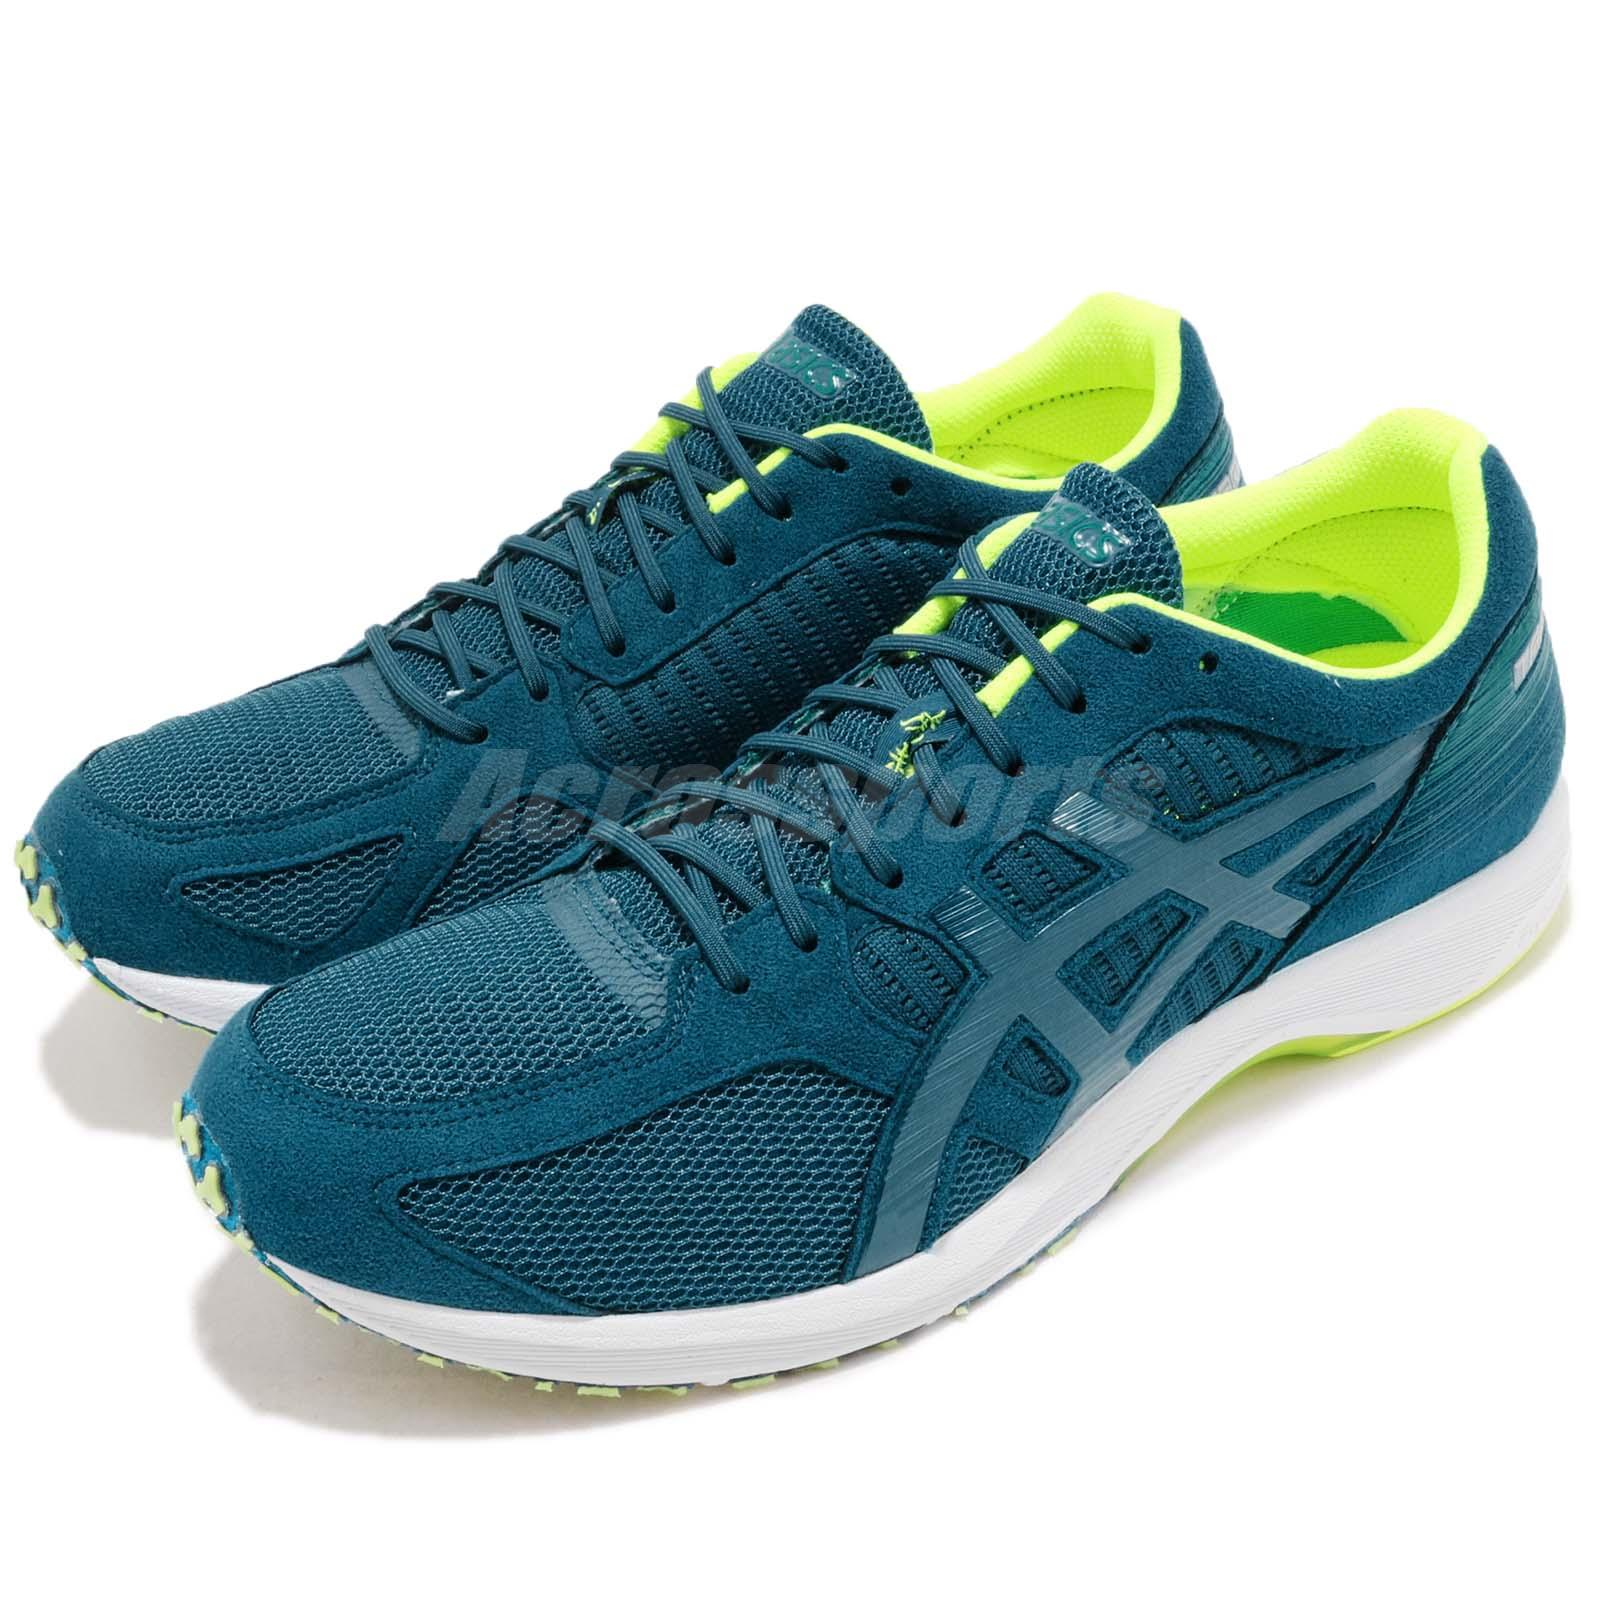 Details about Asics Tartherzeal 6 Deep Aqua Volt White Men Running Shoes Sneakers T820N 401